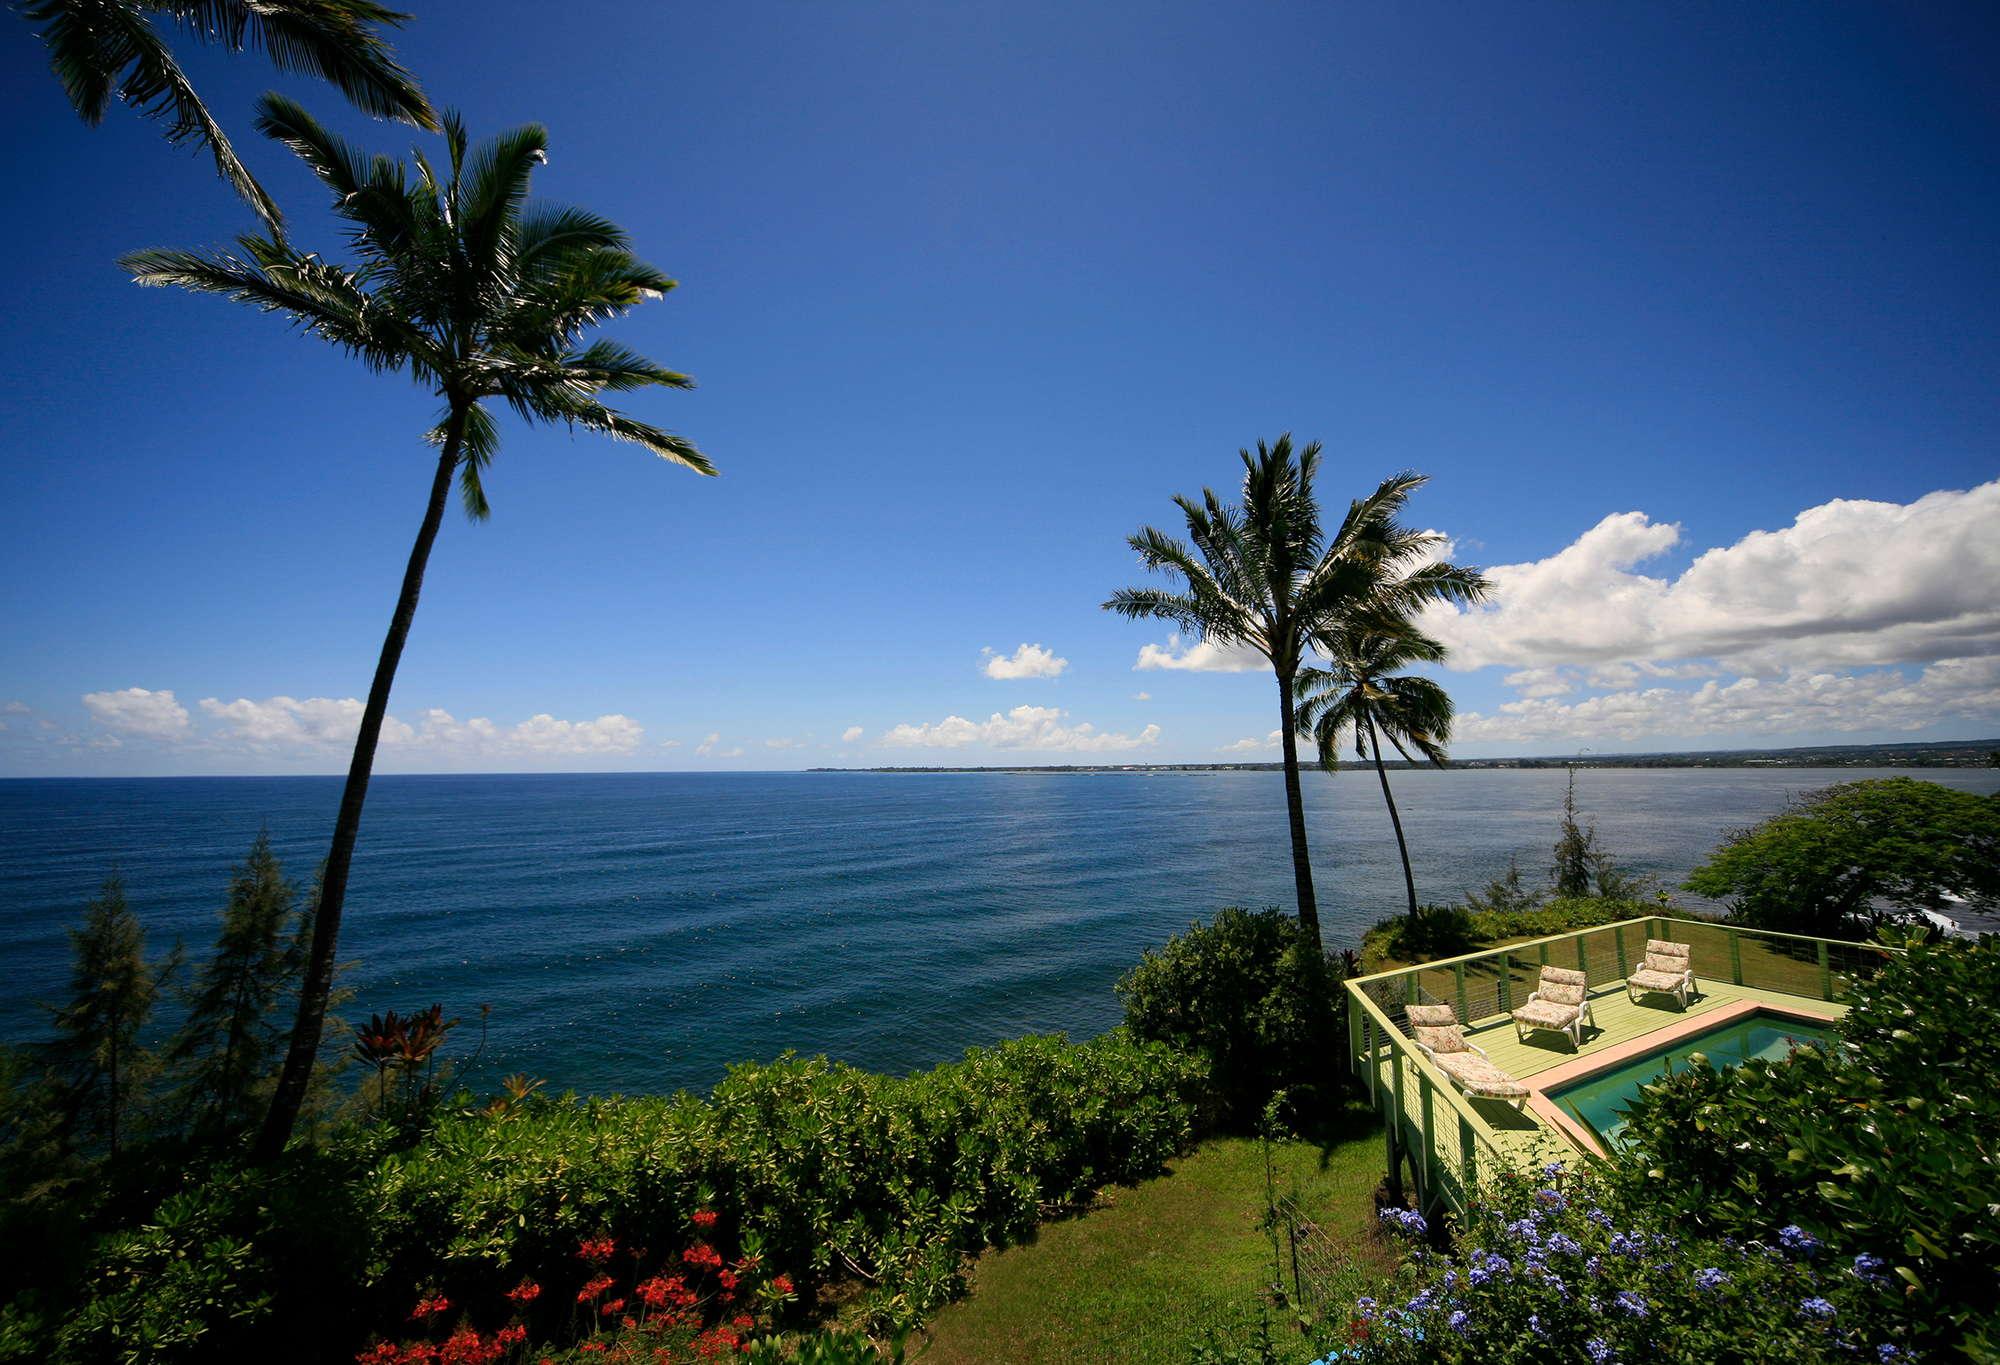 Kona Island Hopper Review